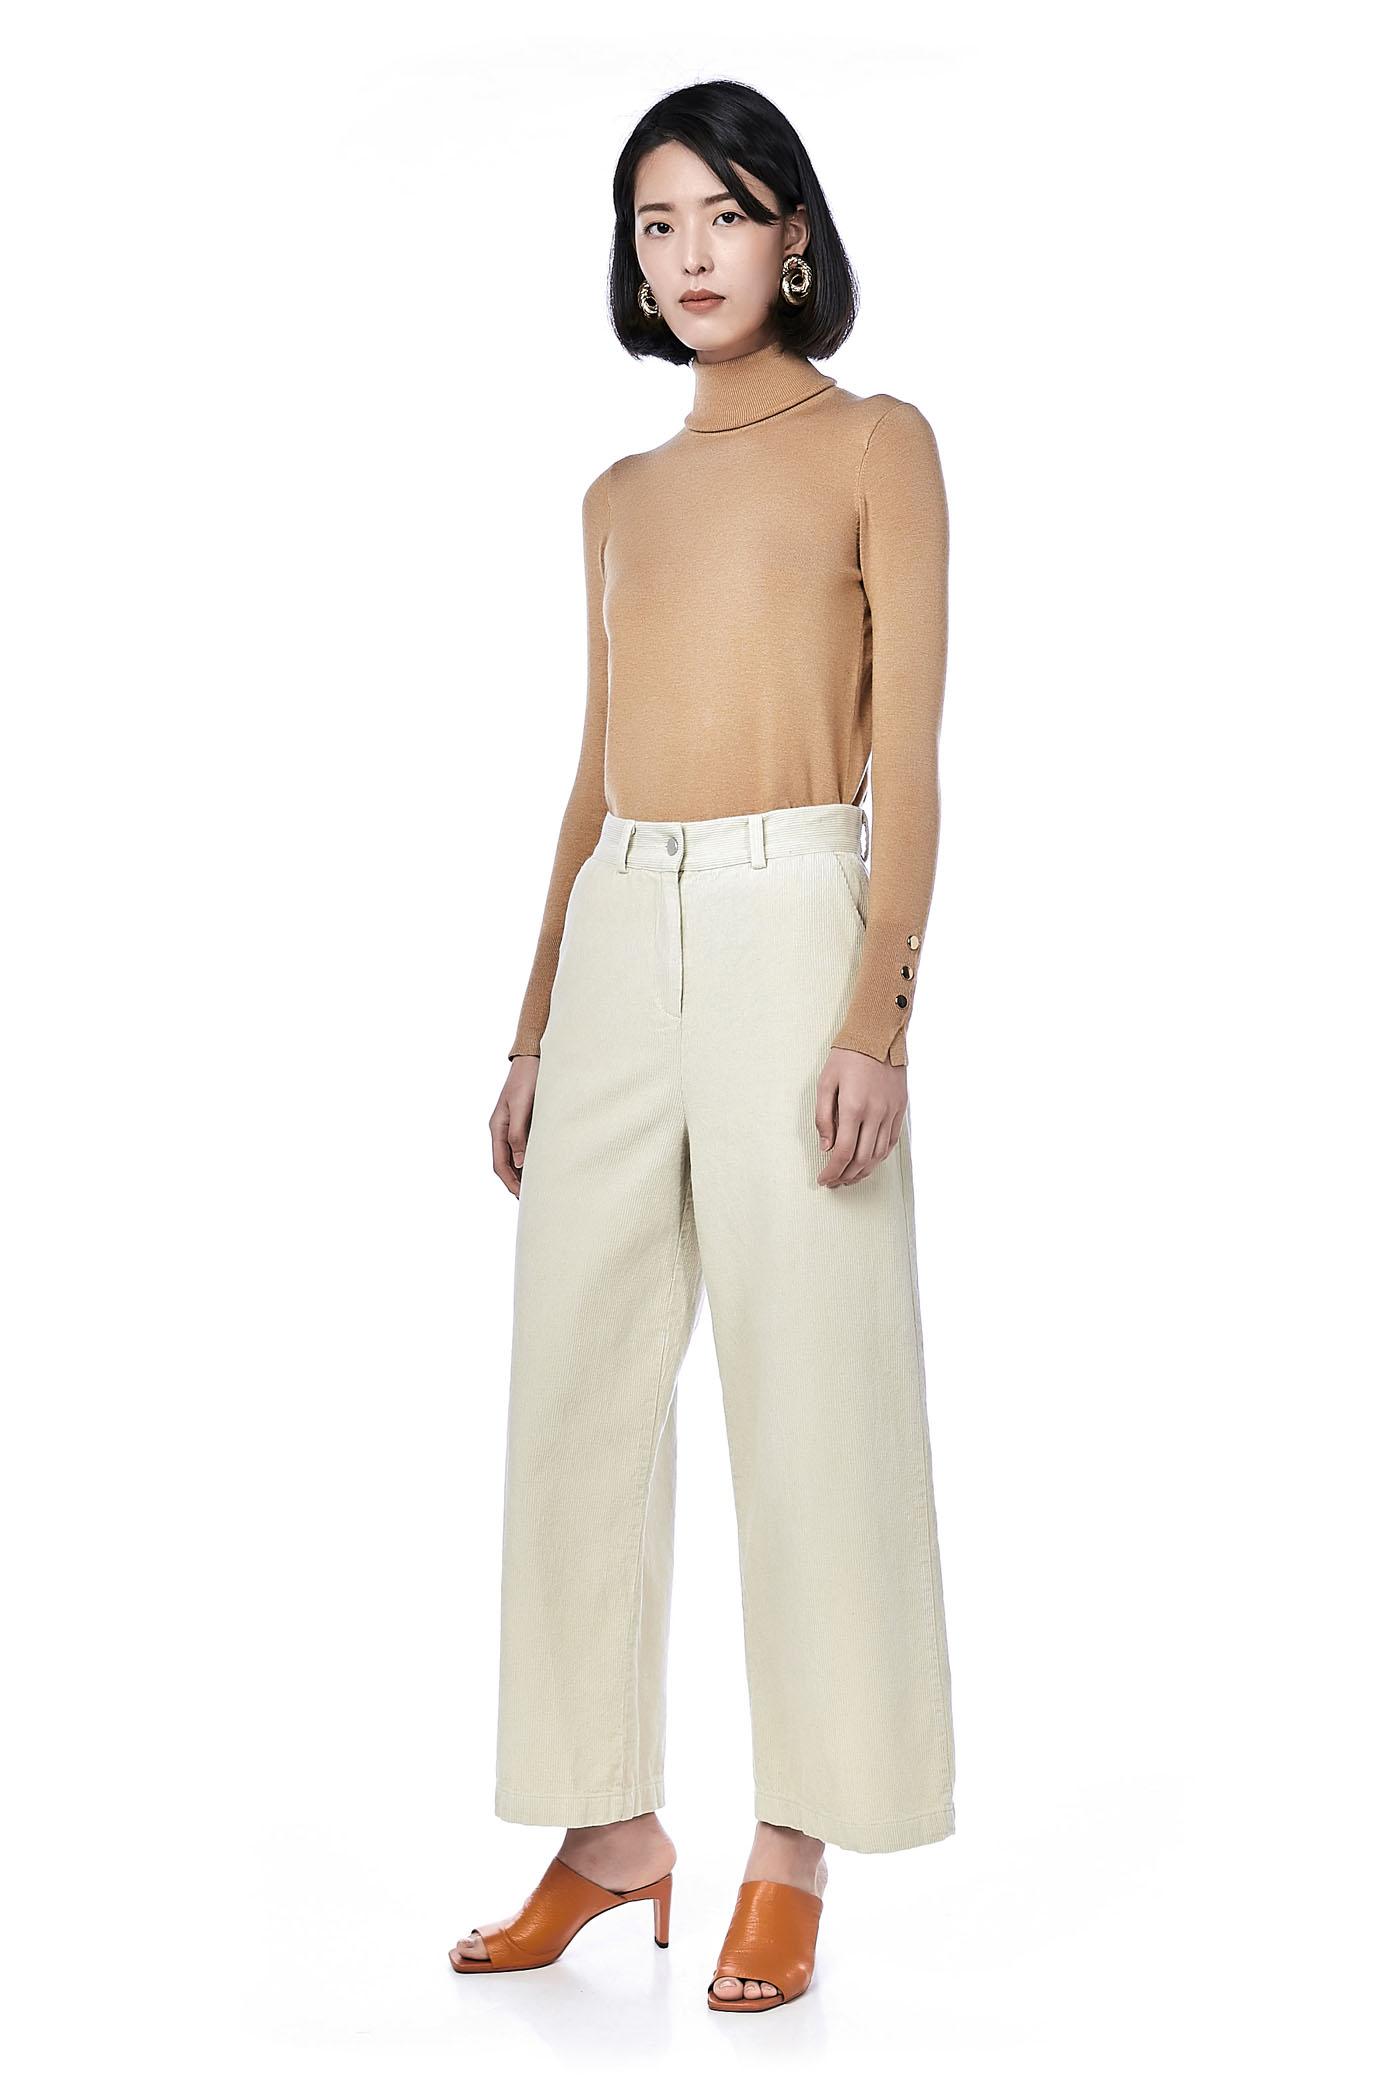 Cleo Corduroy Wide Leg Trousers